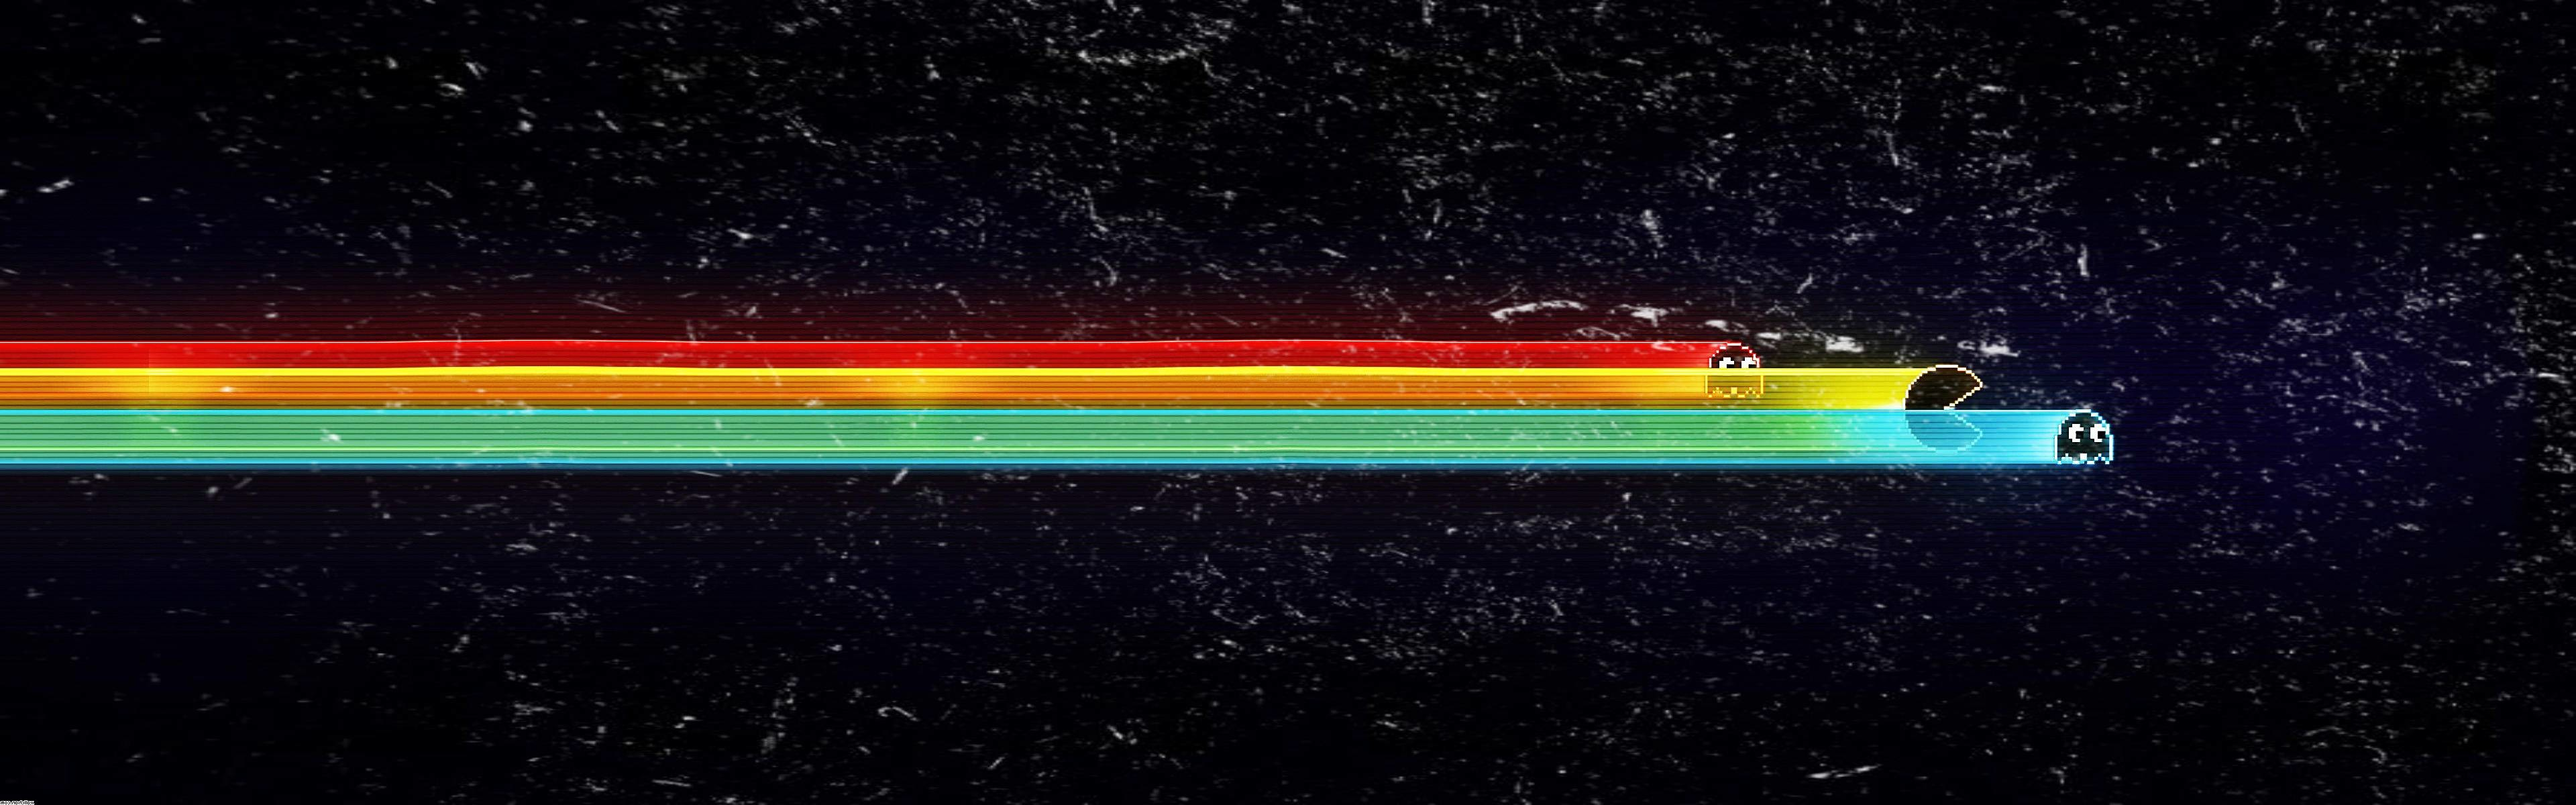 Res: 3840x1200, Pacman Wallpaper Dual Screen [3840 x 1200]